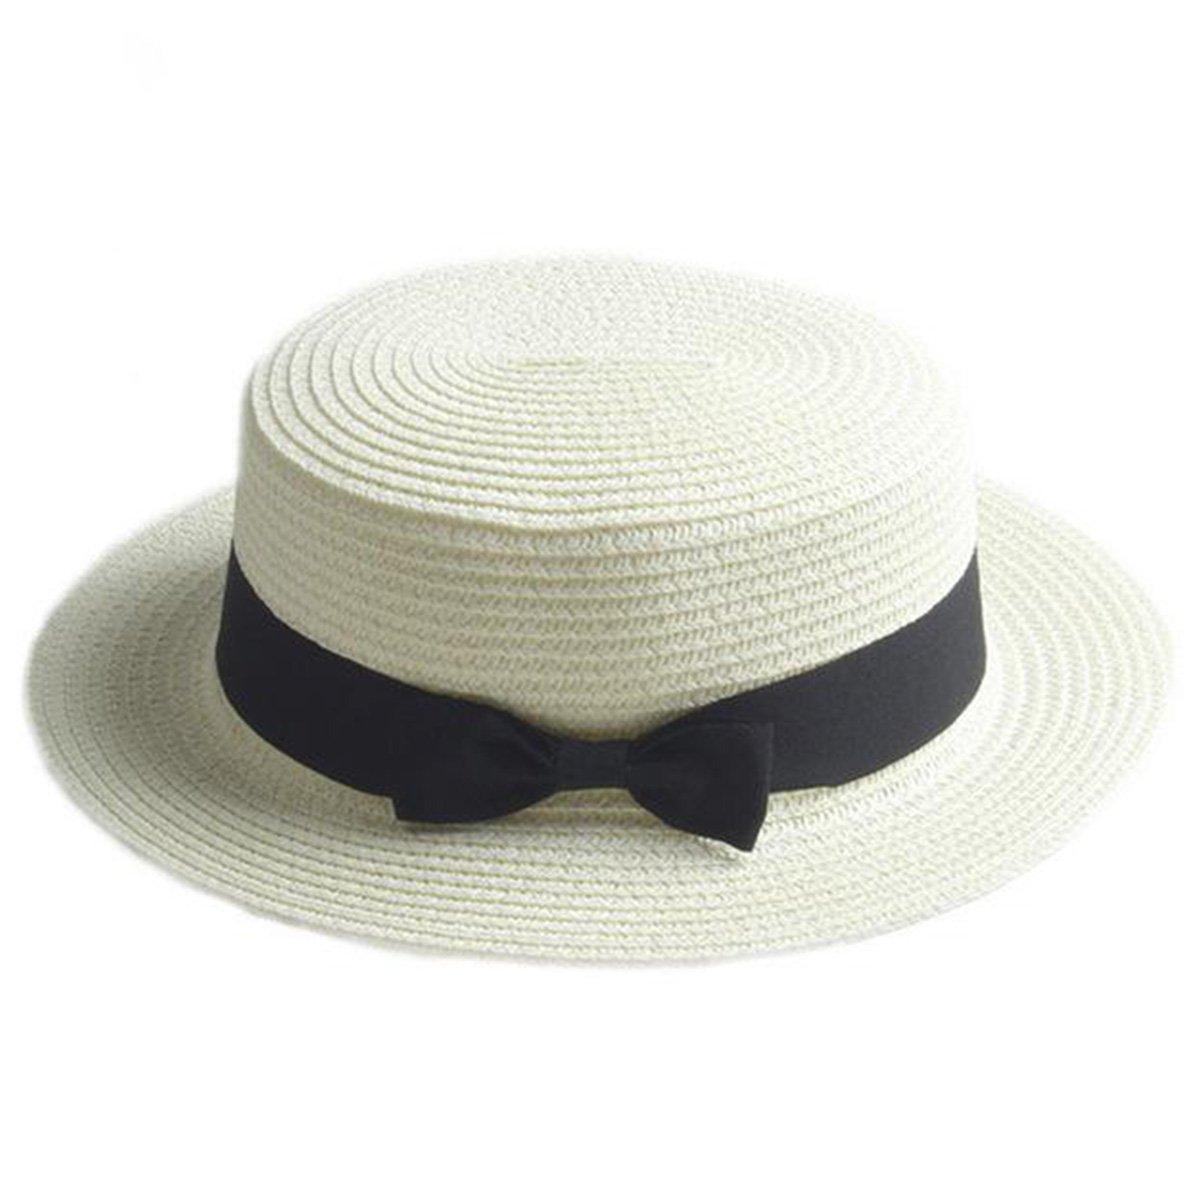 Boater Hat Sombrero de paja para mujer Bowknot Round Flat Top Brim Sombrero  de paja Summer 0171e4d5166